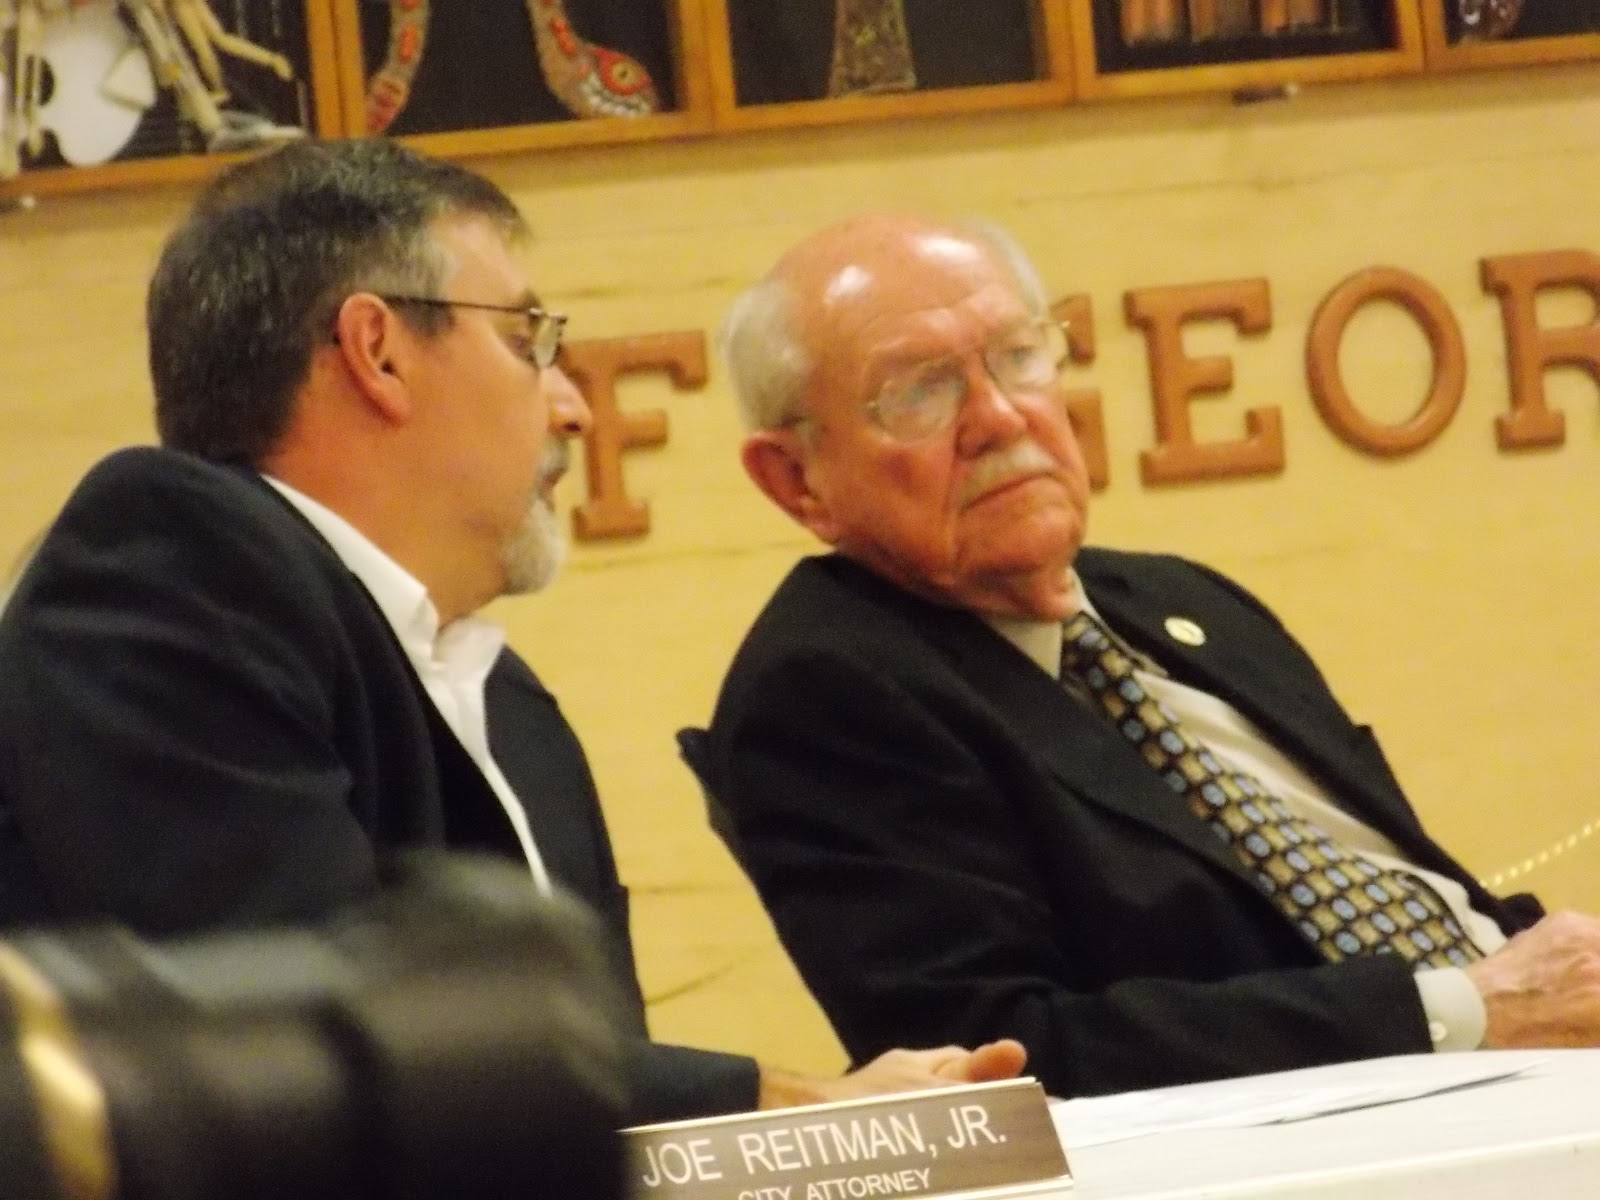 city attorney joe reitman jr talks to mayor ivie hoping to hear some precise language